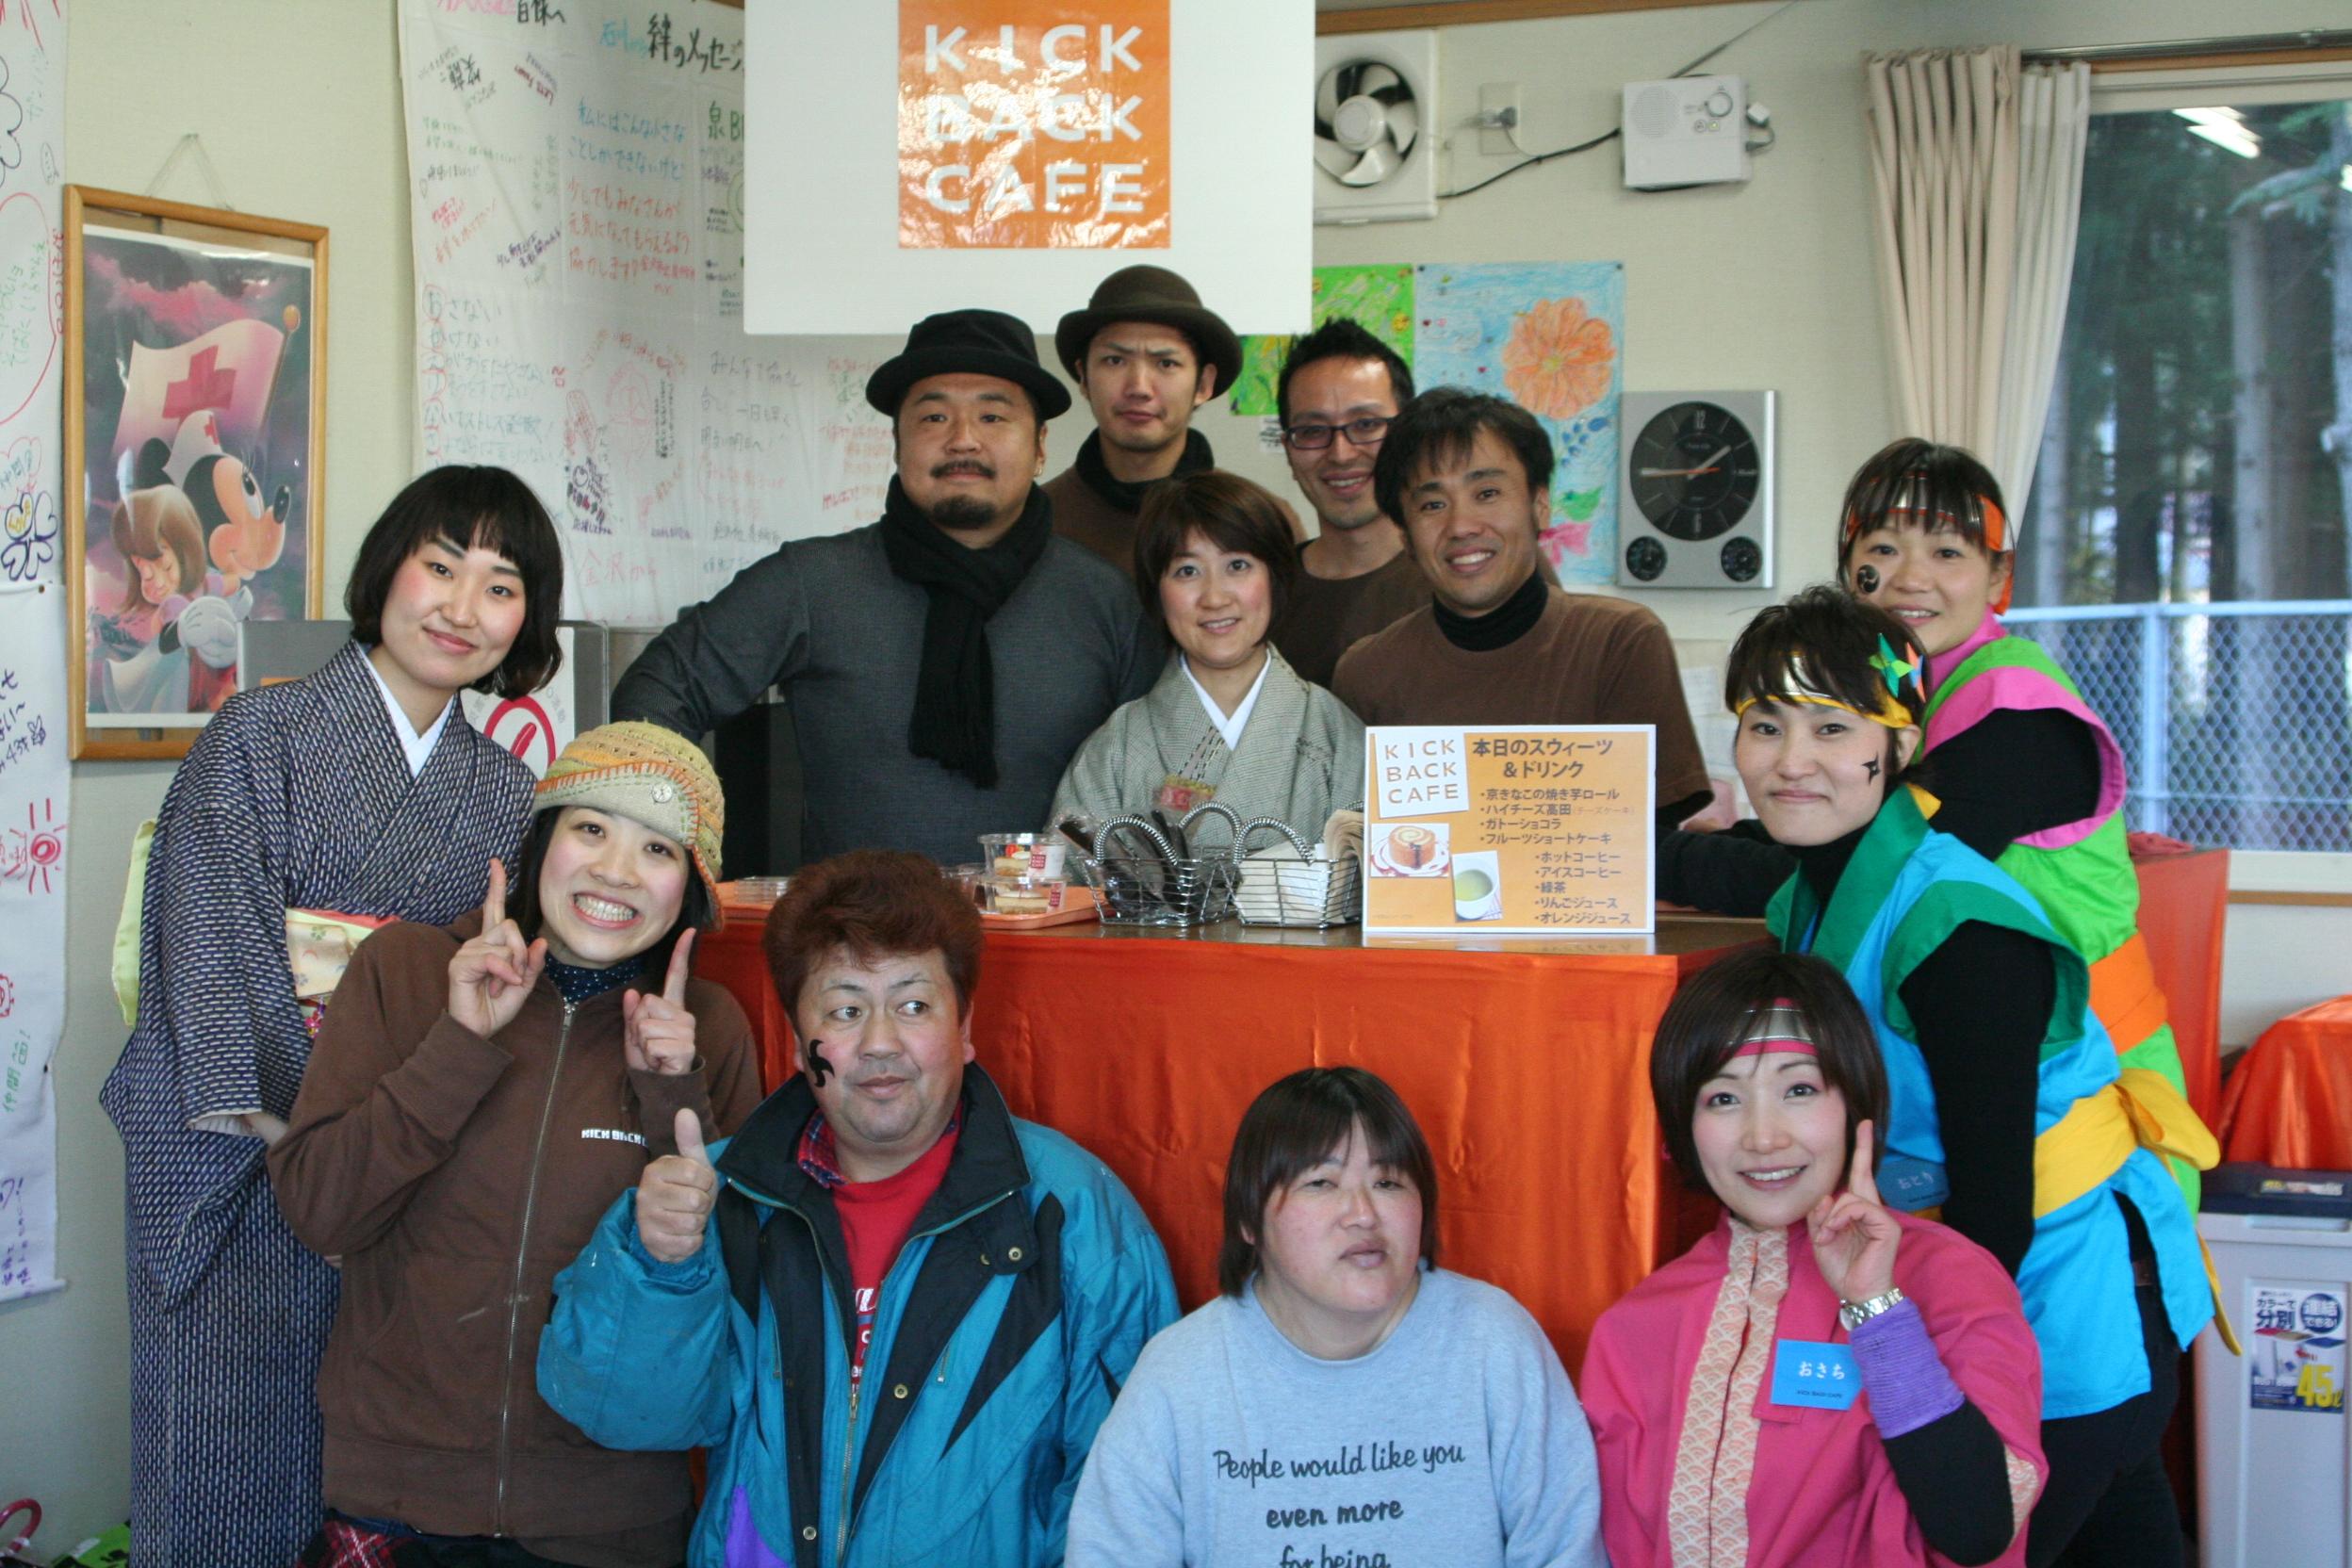 http://www.kickbackcafe.jp/support2/report/IMG_6025.JPG